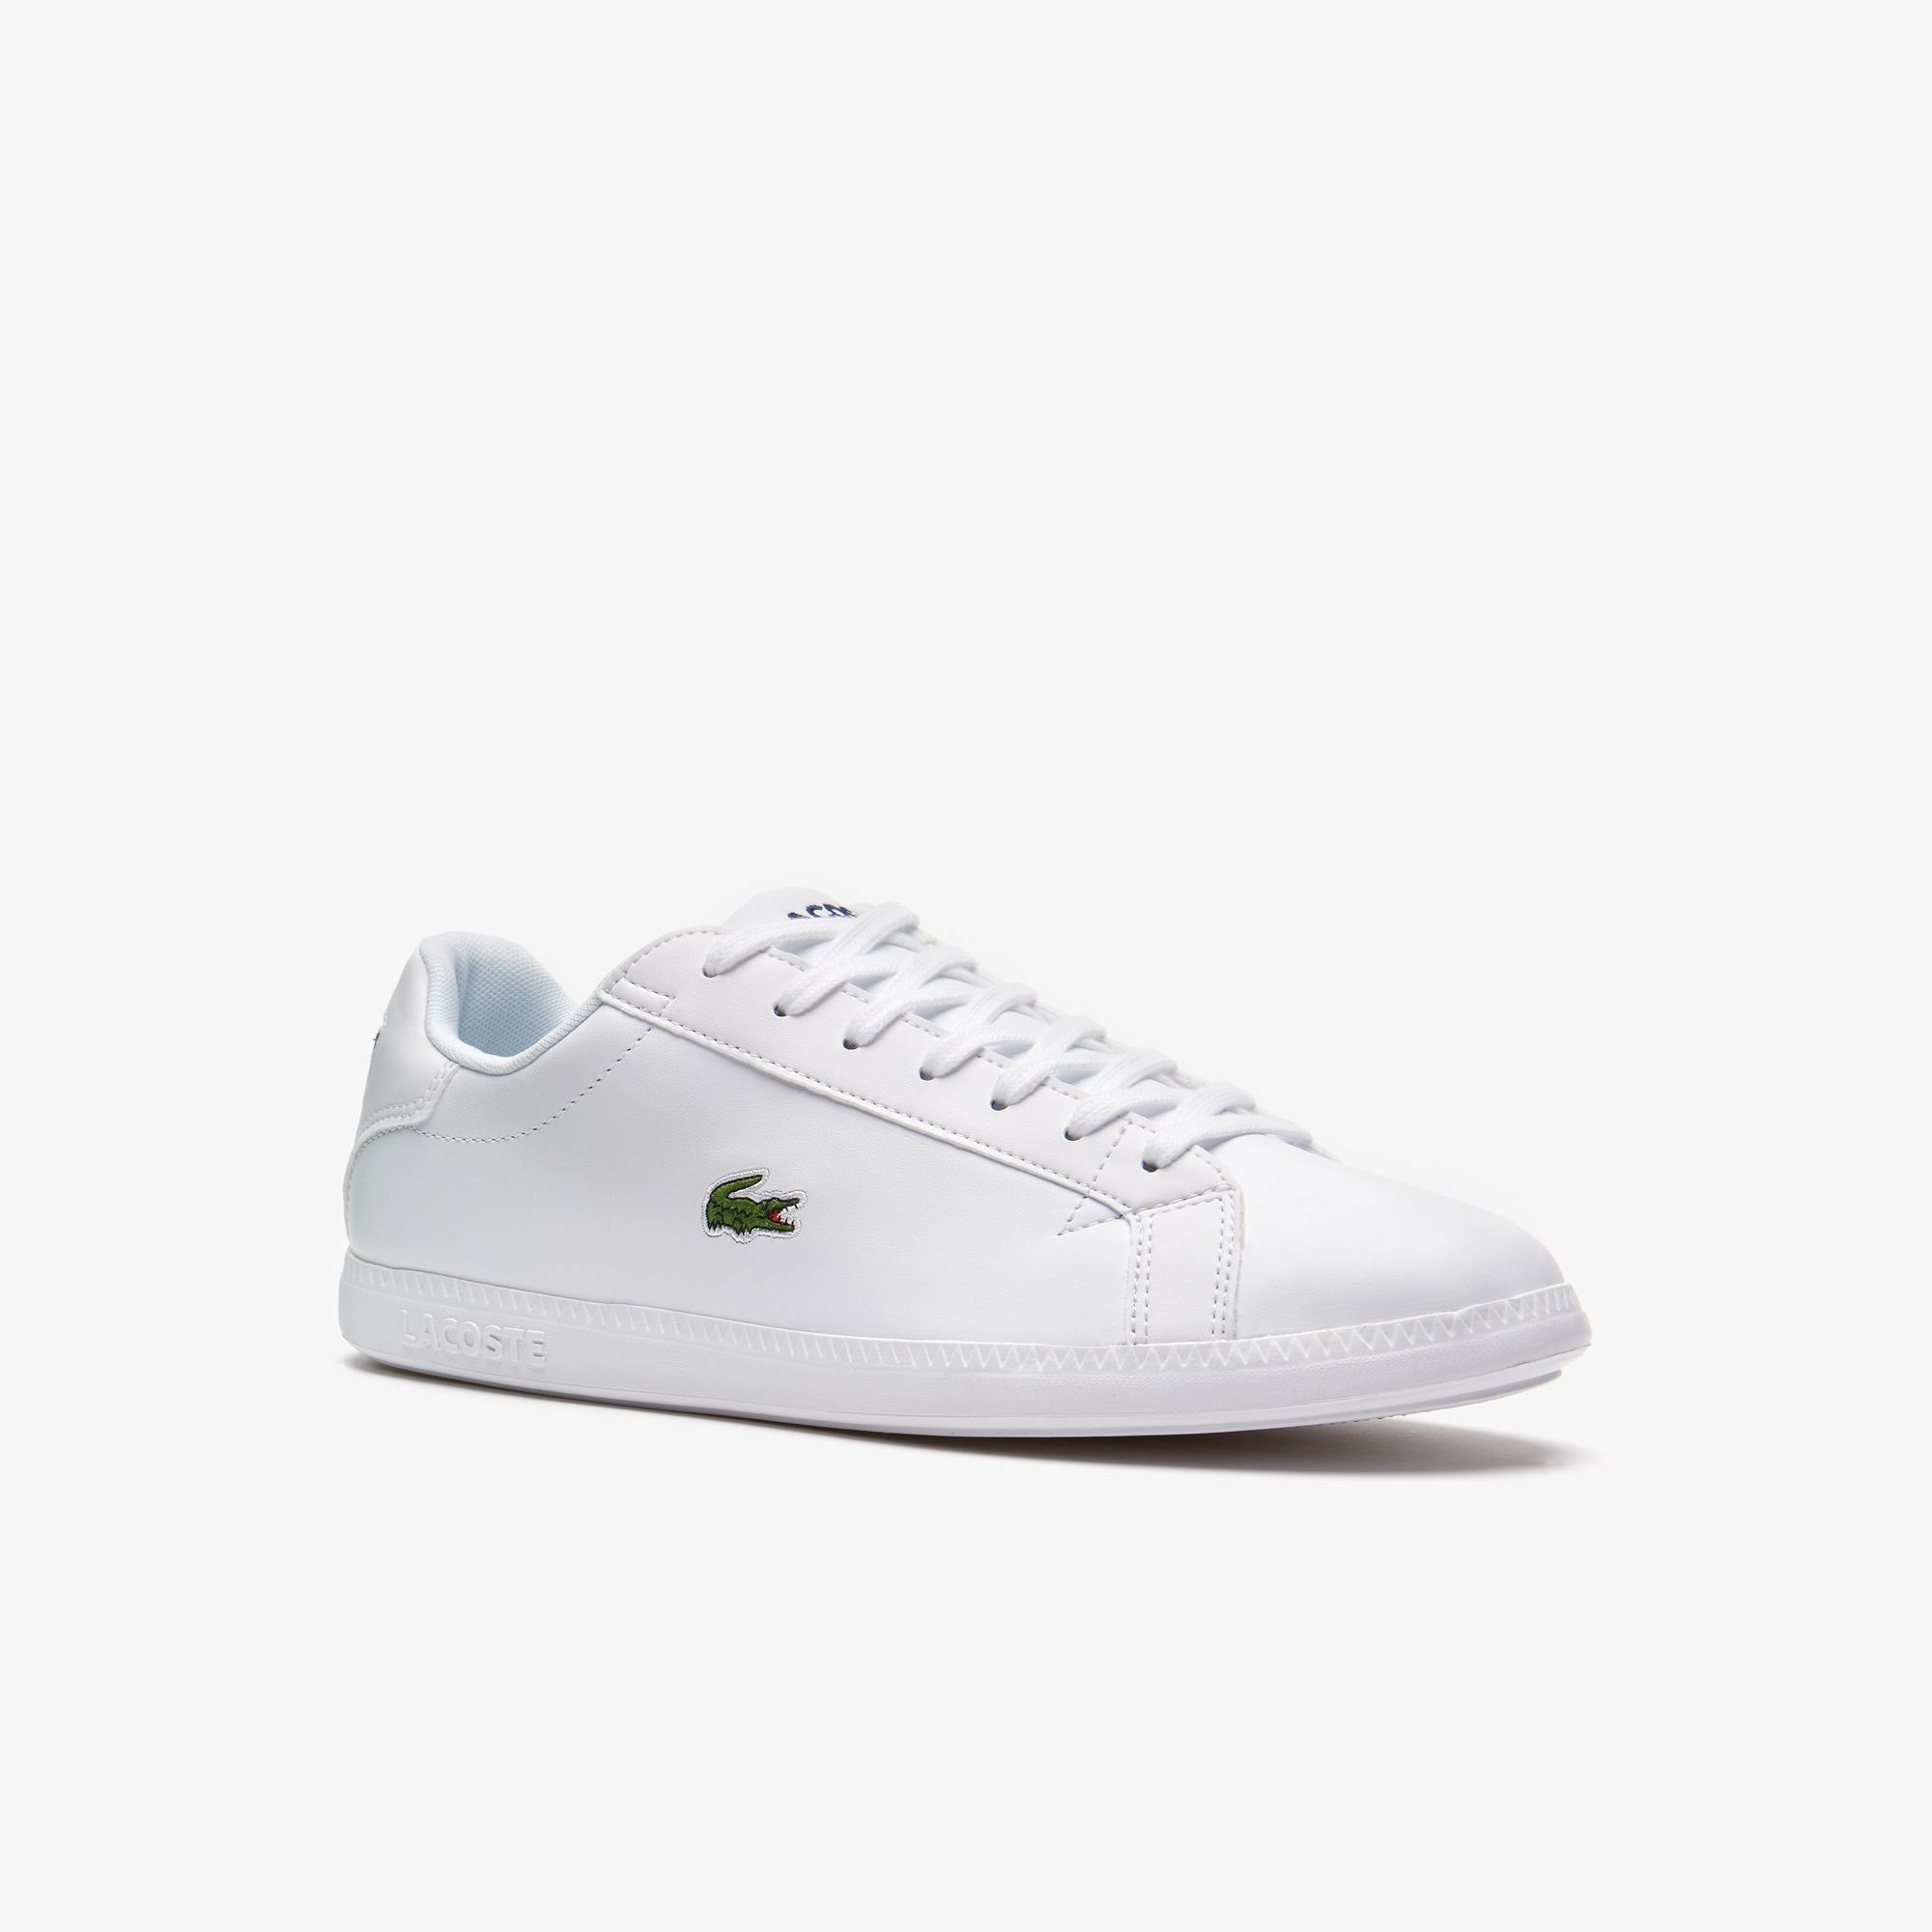 Lacoste Graduate BL 1 Men's Sneakers